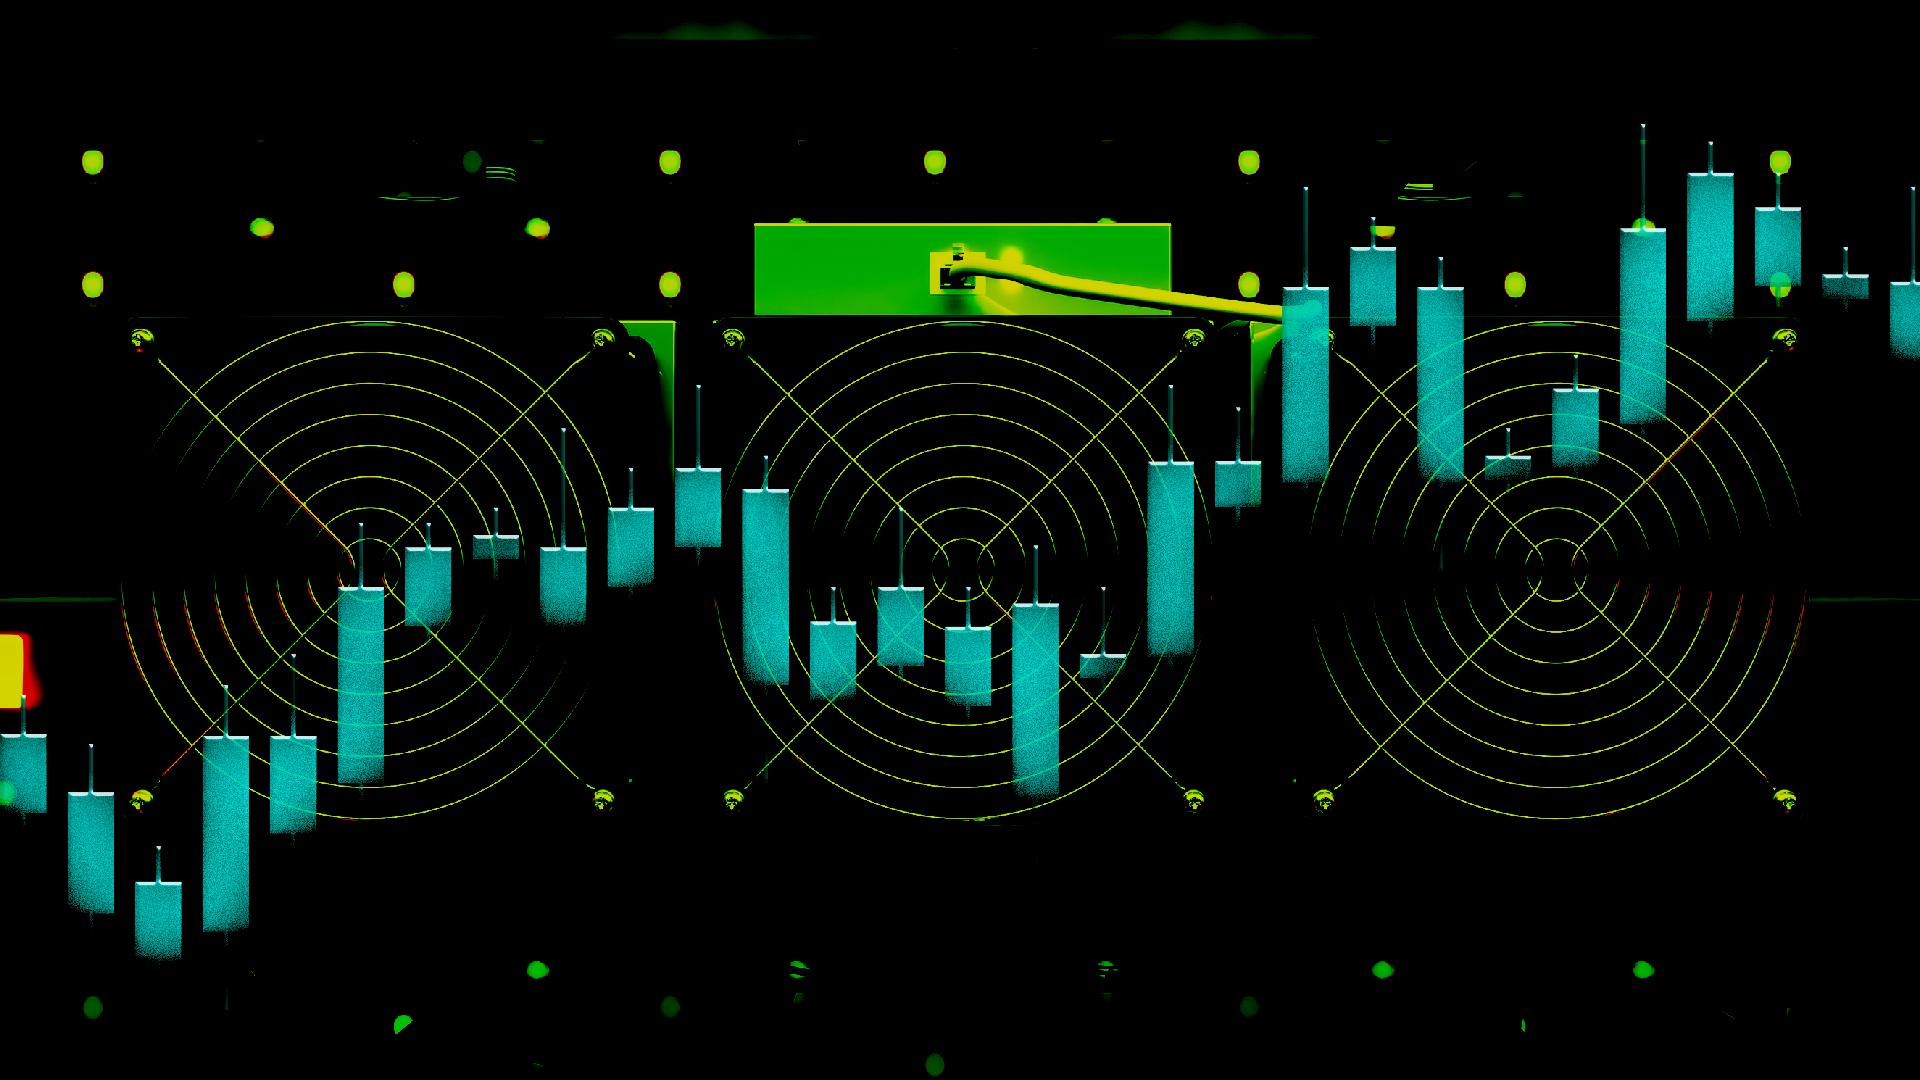 Market insiders struggle to explain Asia's typically bearish crypto trading sessions